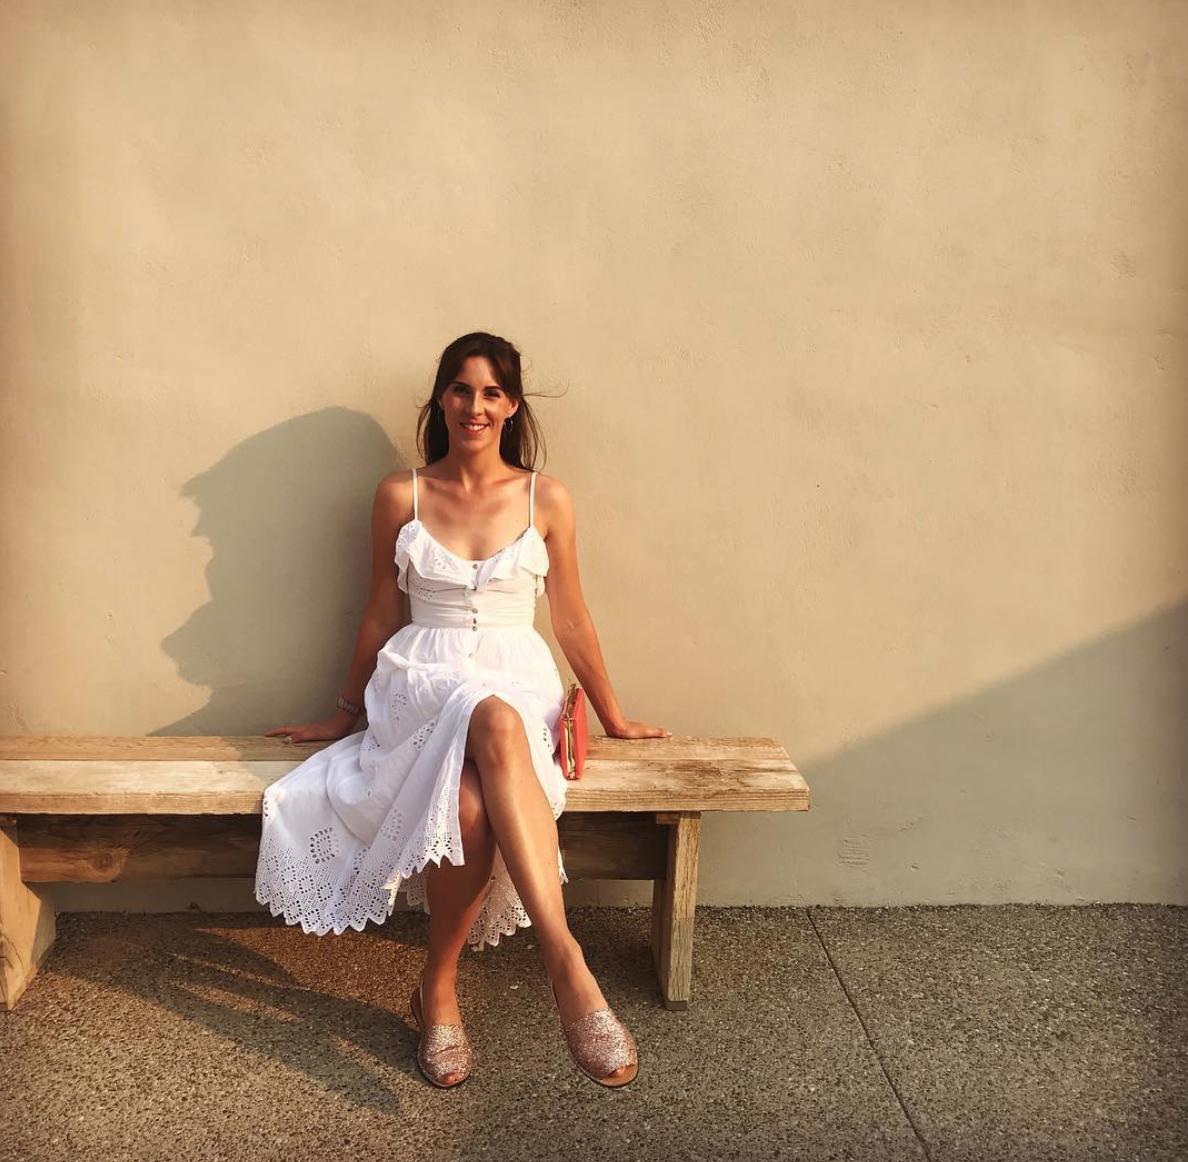 Verity Rushworth Instagram